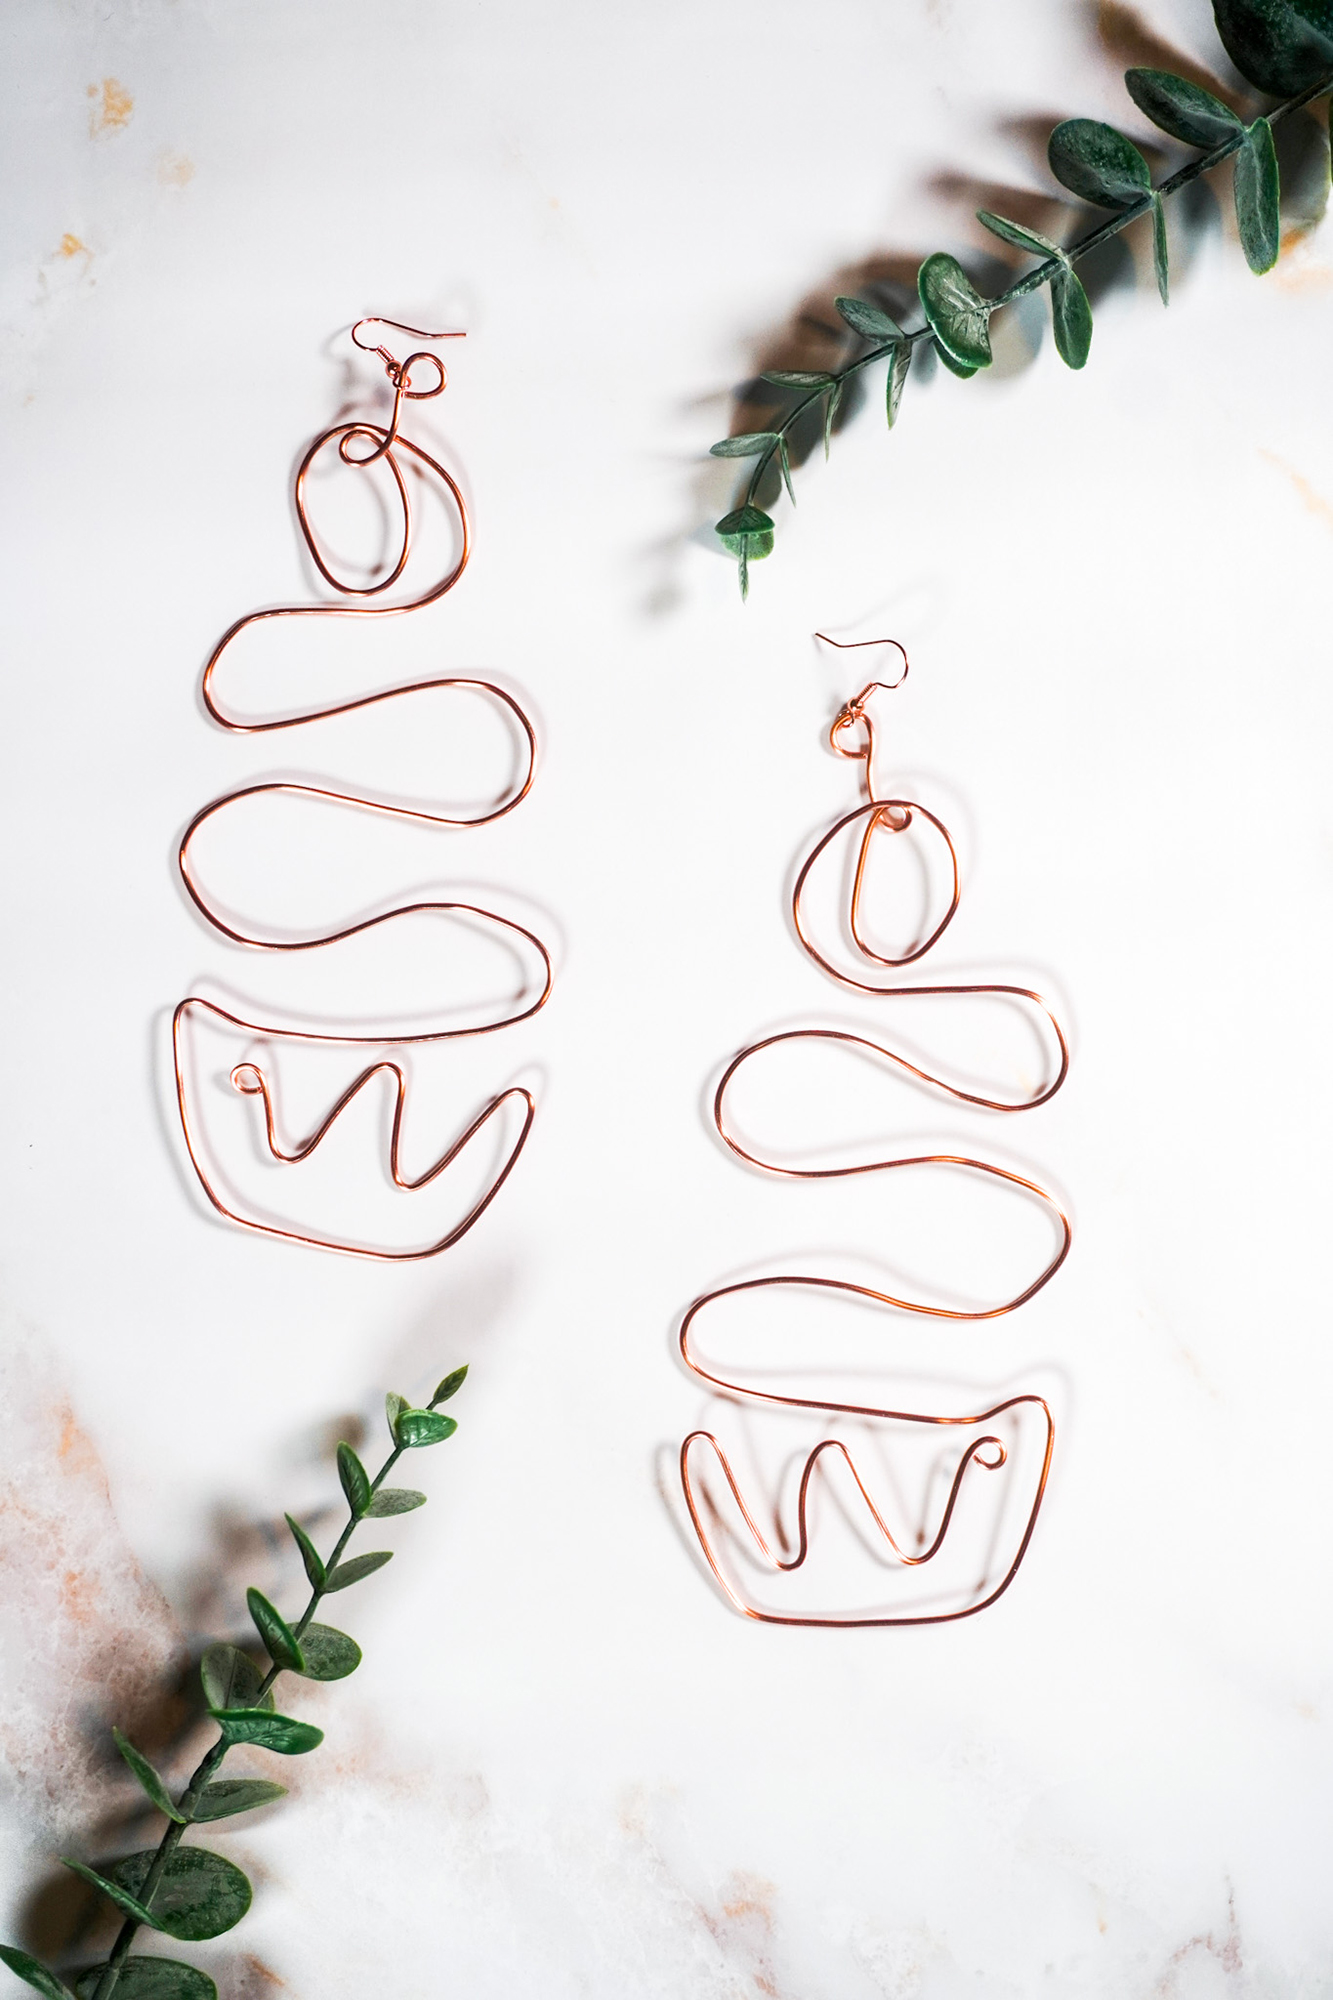 Image of handmade wire earrings